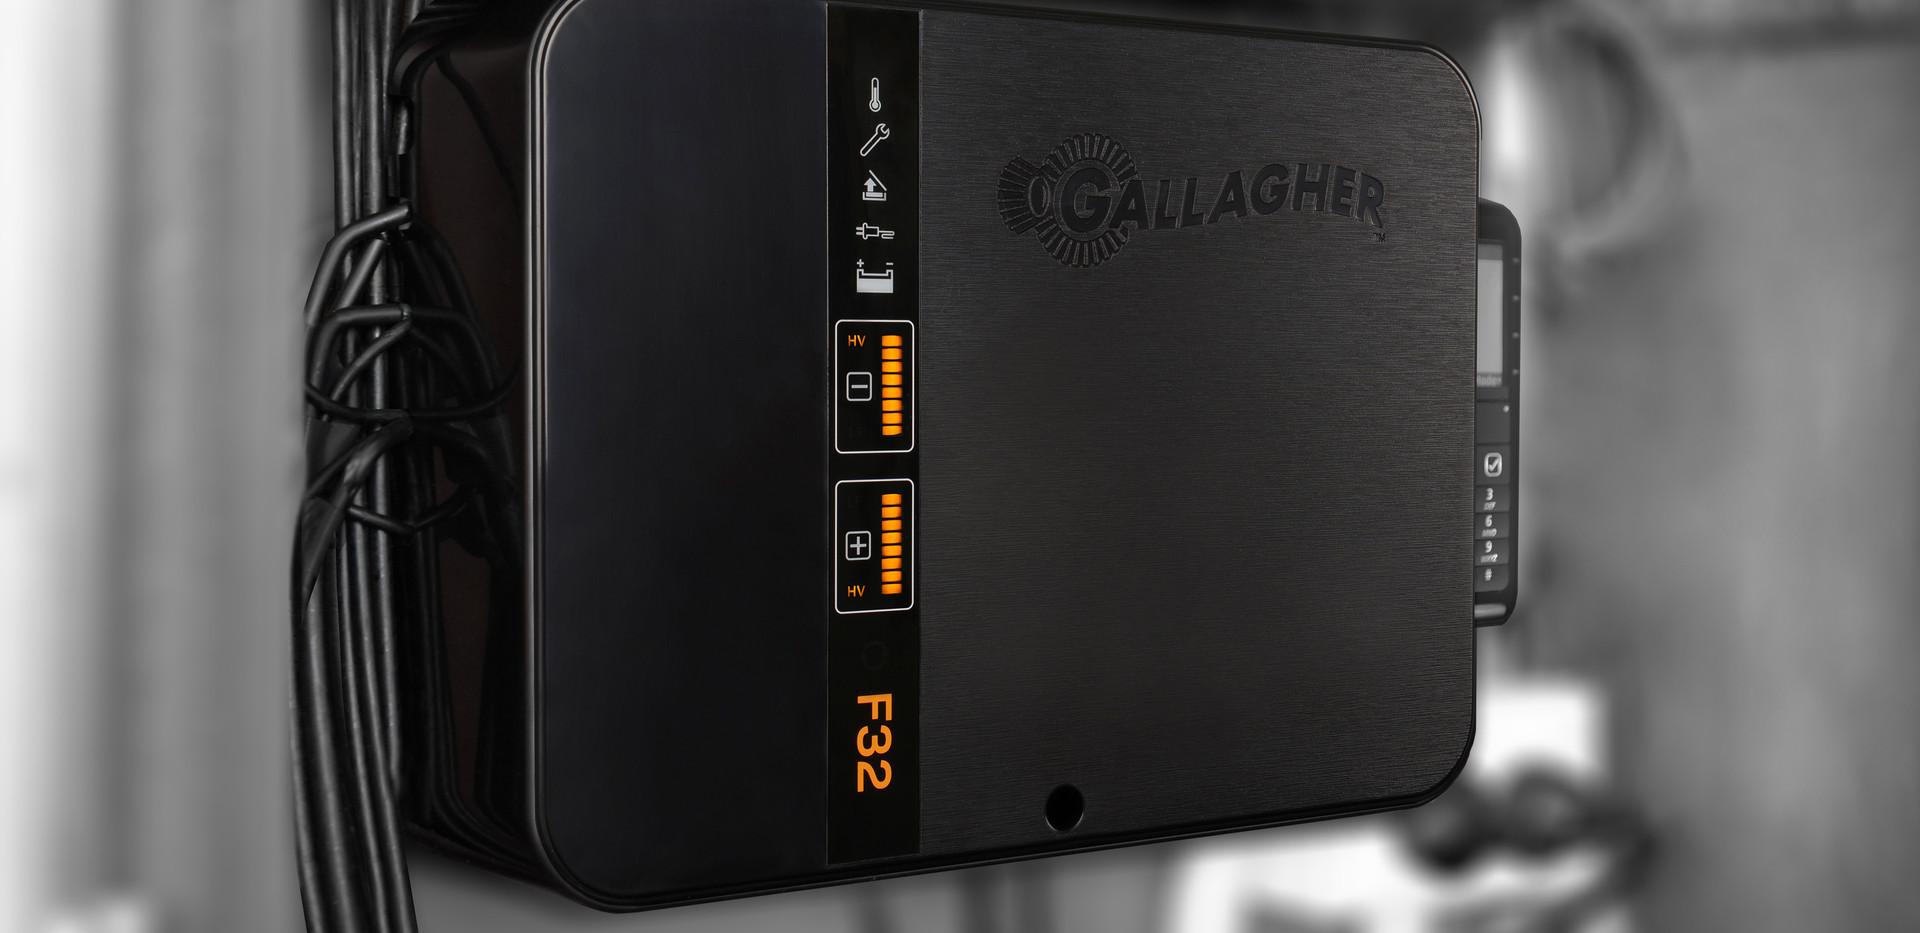 Gallagher Energizer